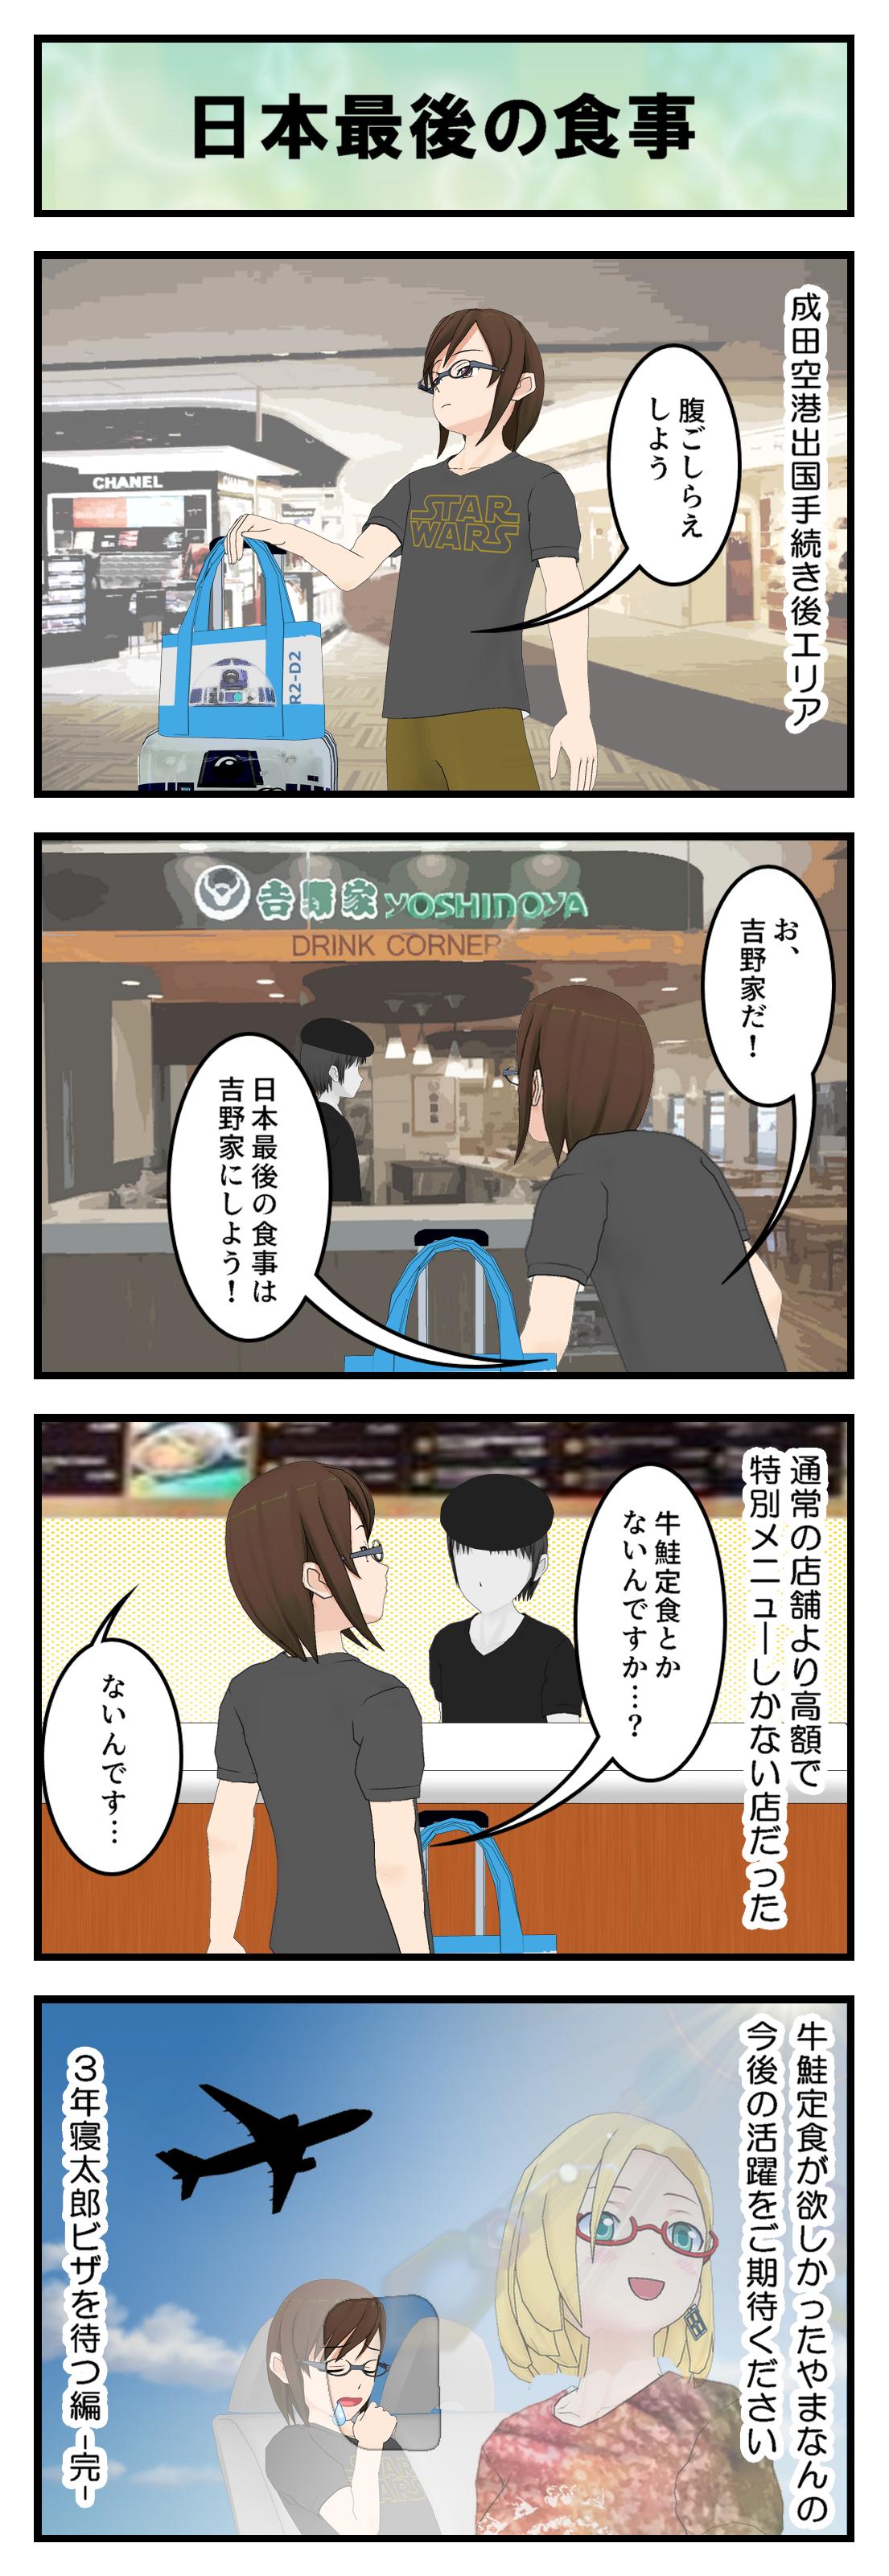 Q213_吉野家2_001